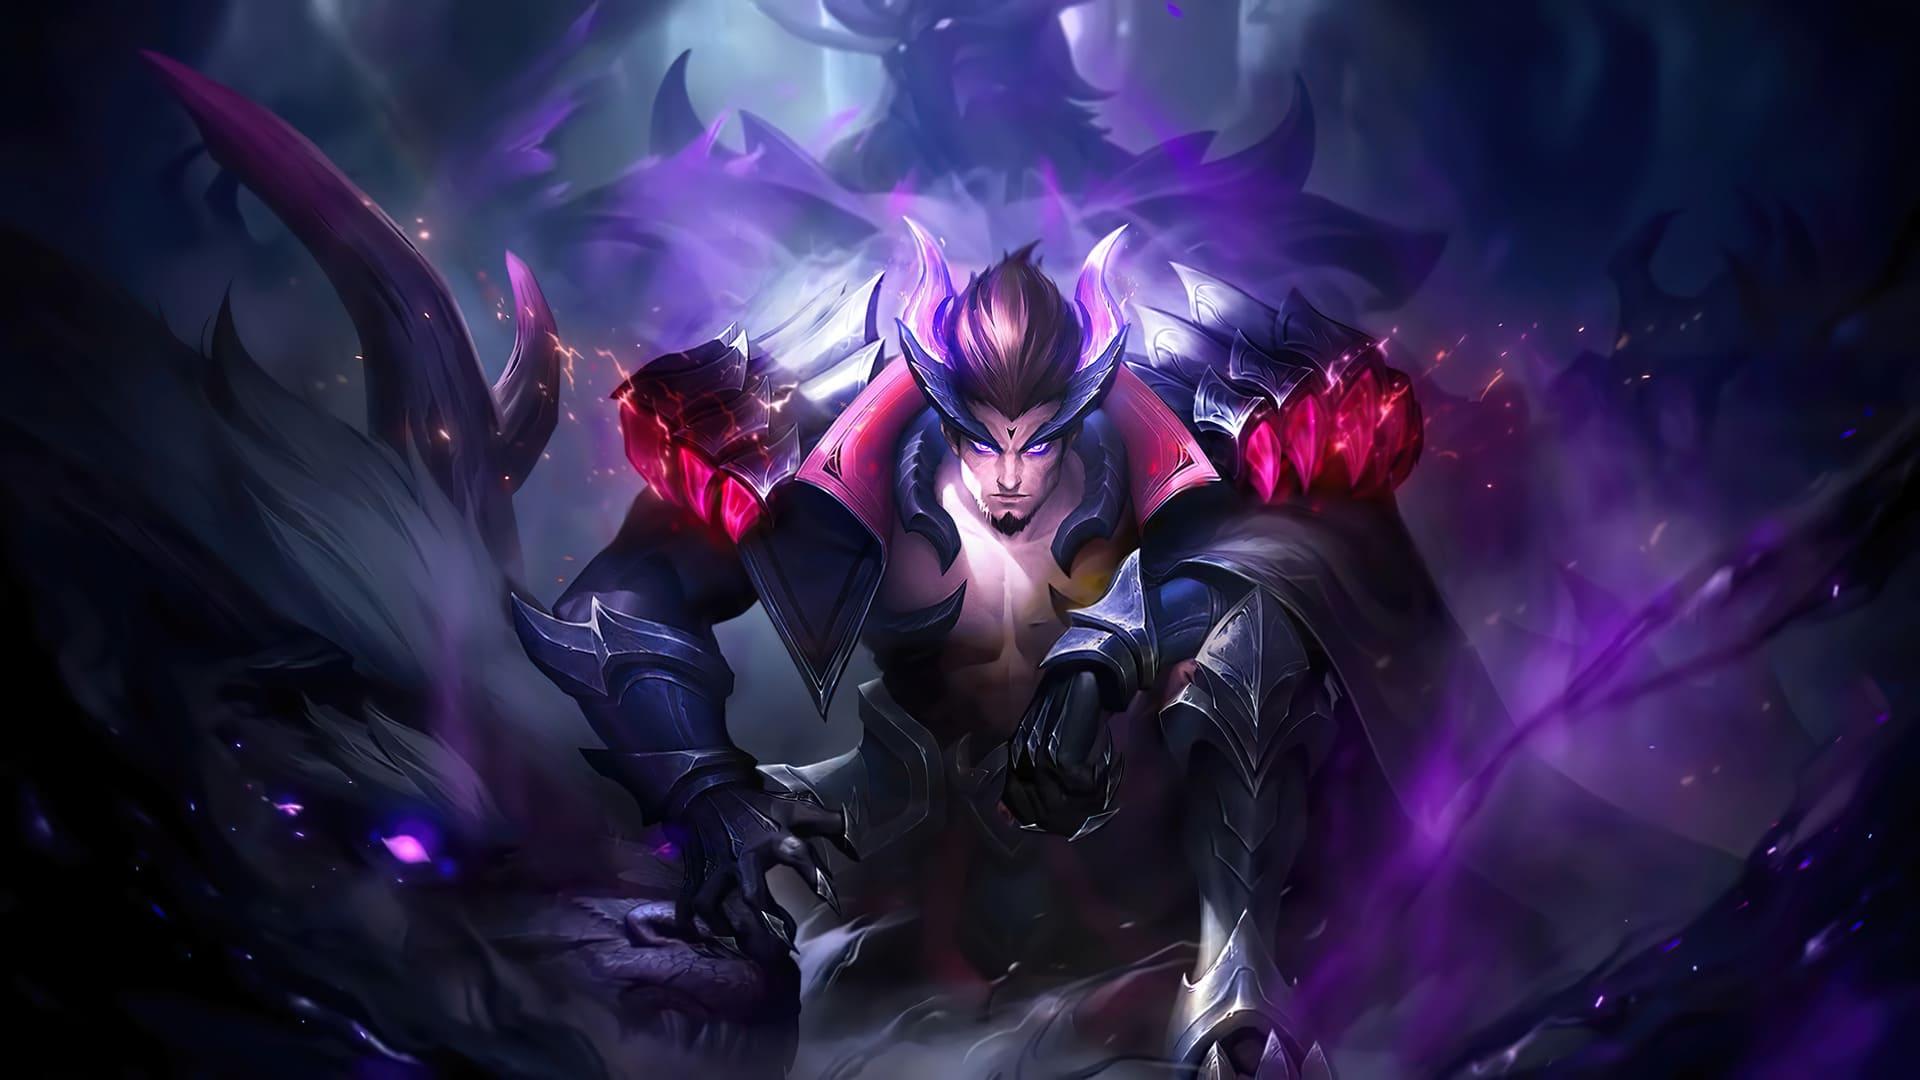 wallpaper Yu Zhong mobile-legends-black-fierce-dragon-hobigame.jpg